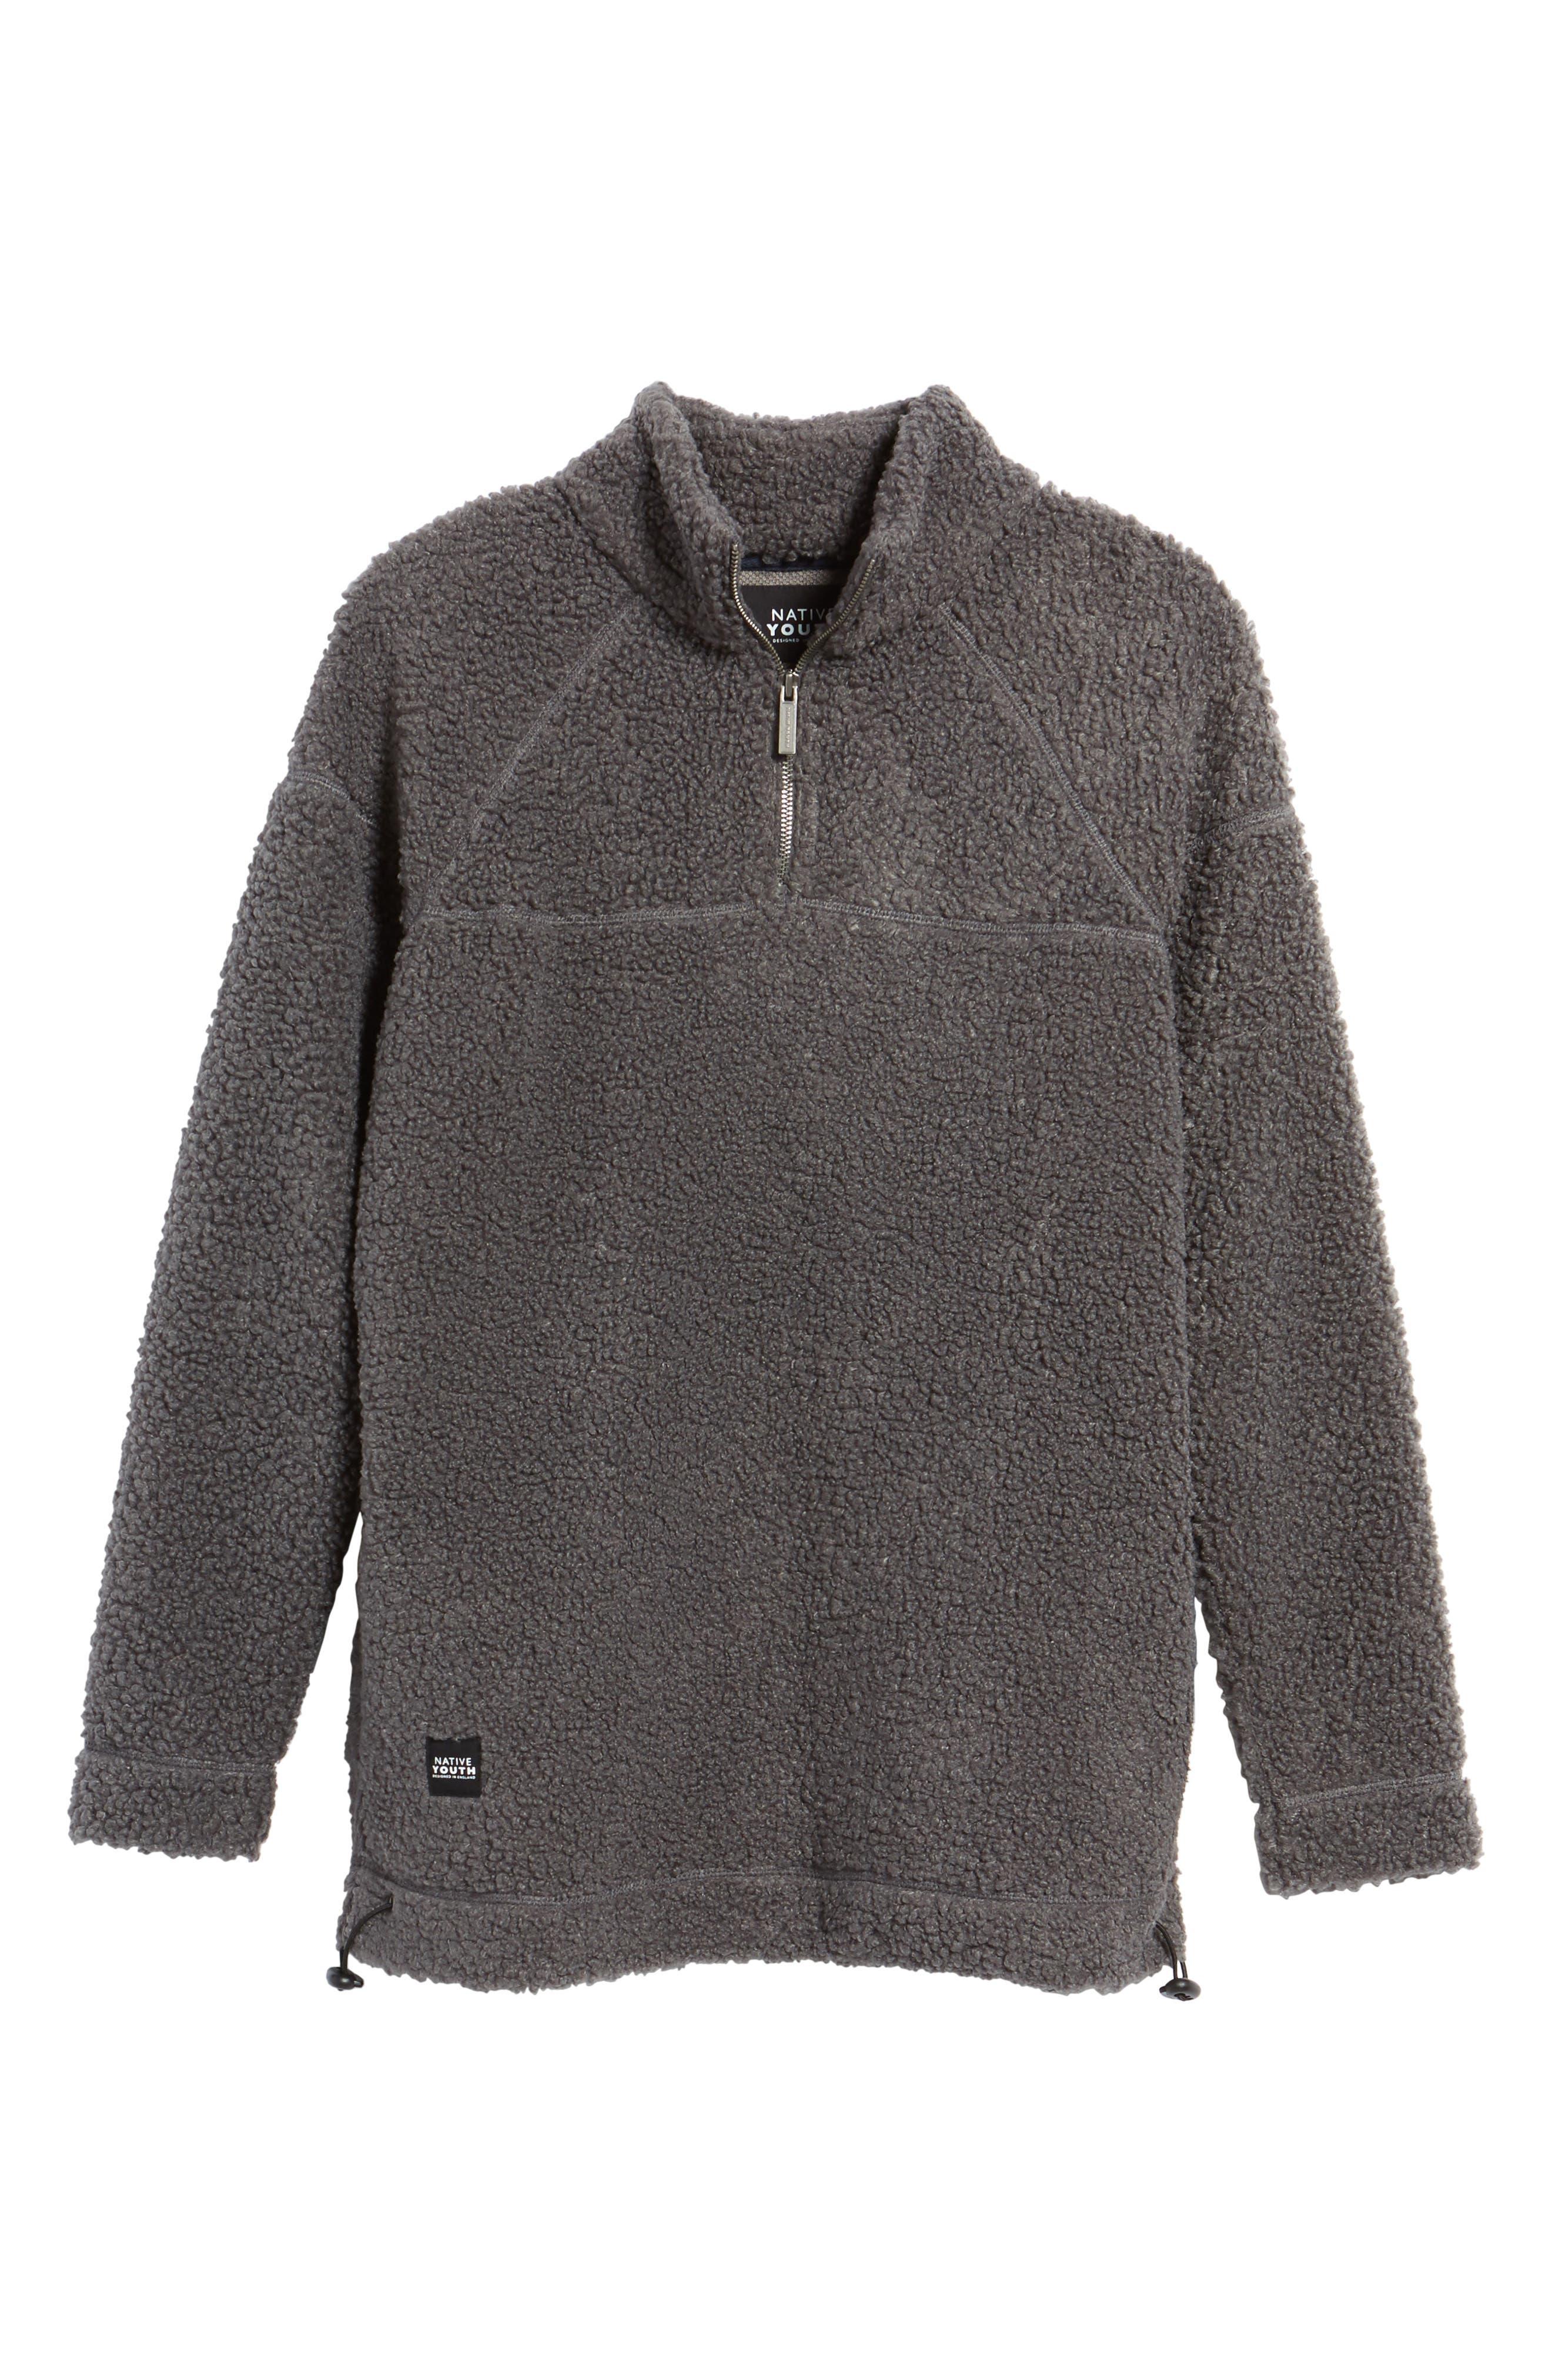 Warlock Faux Shearling Quarter Zip Sweater,                             Alternate thumbnail 6, color,                             023